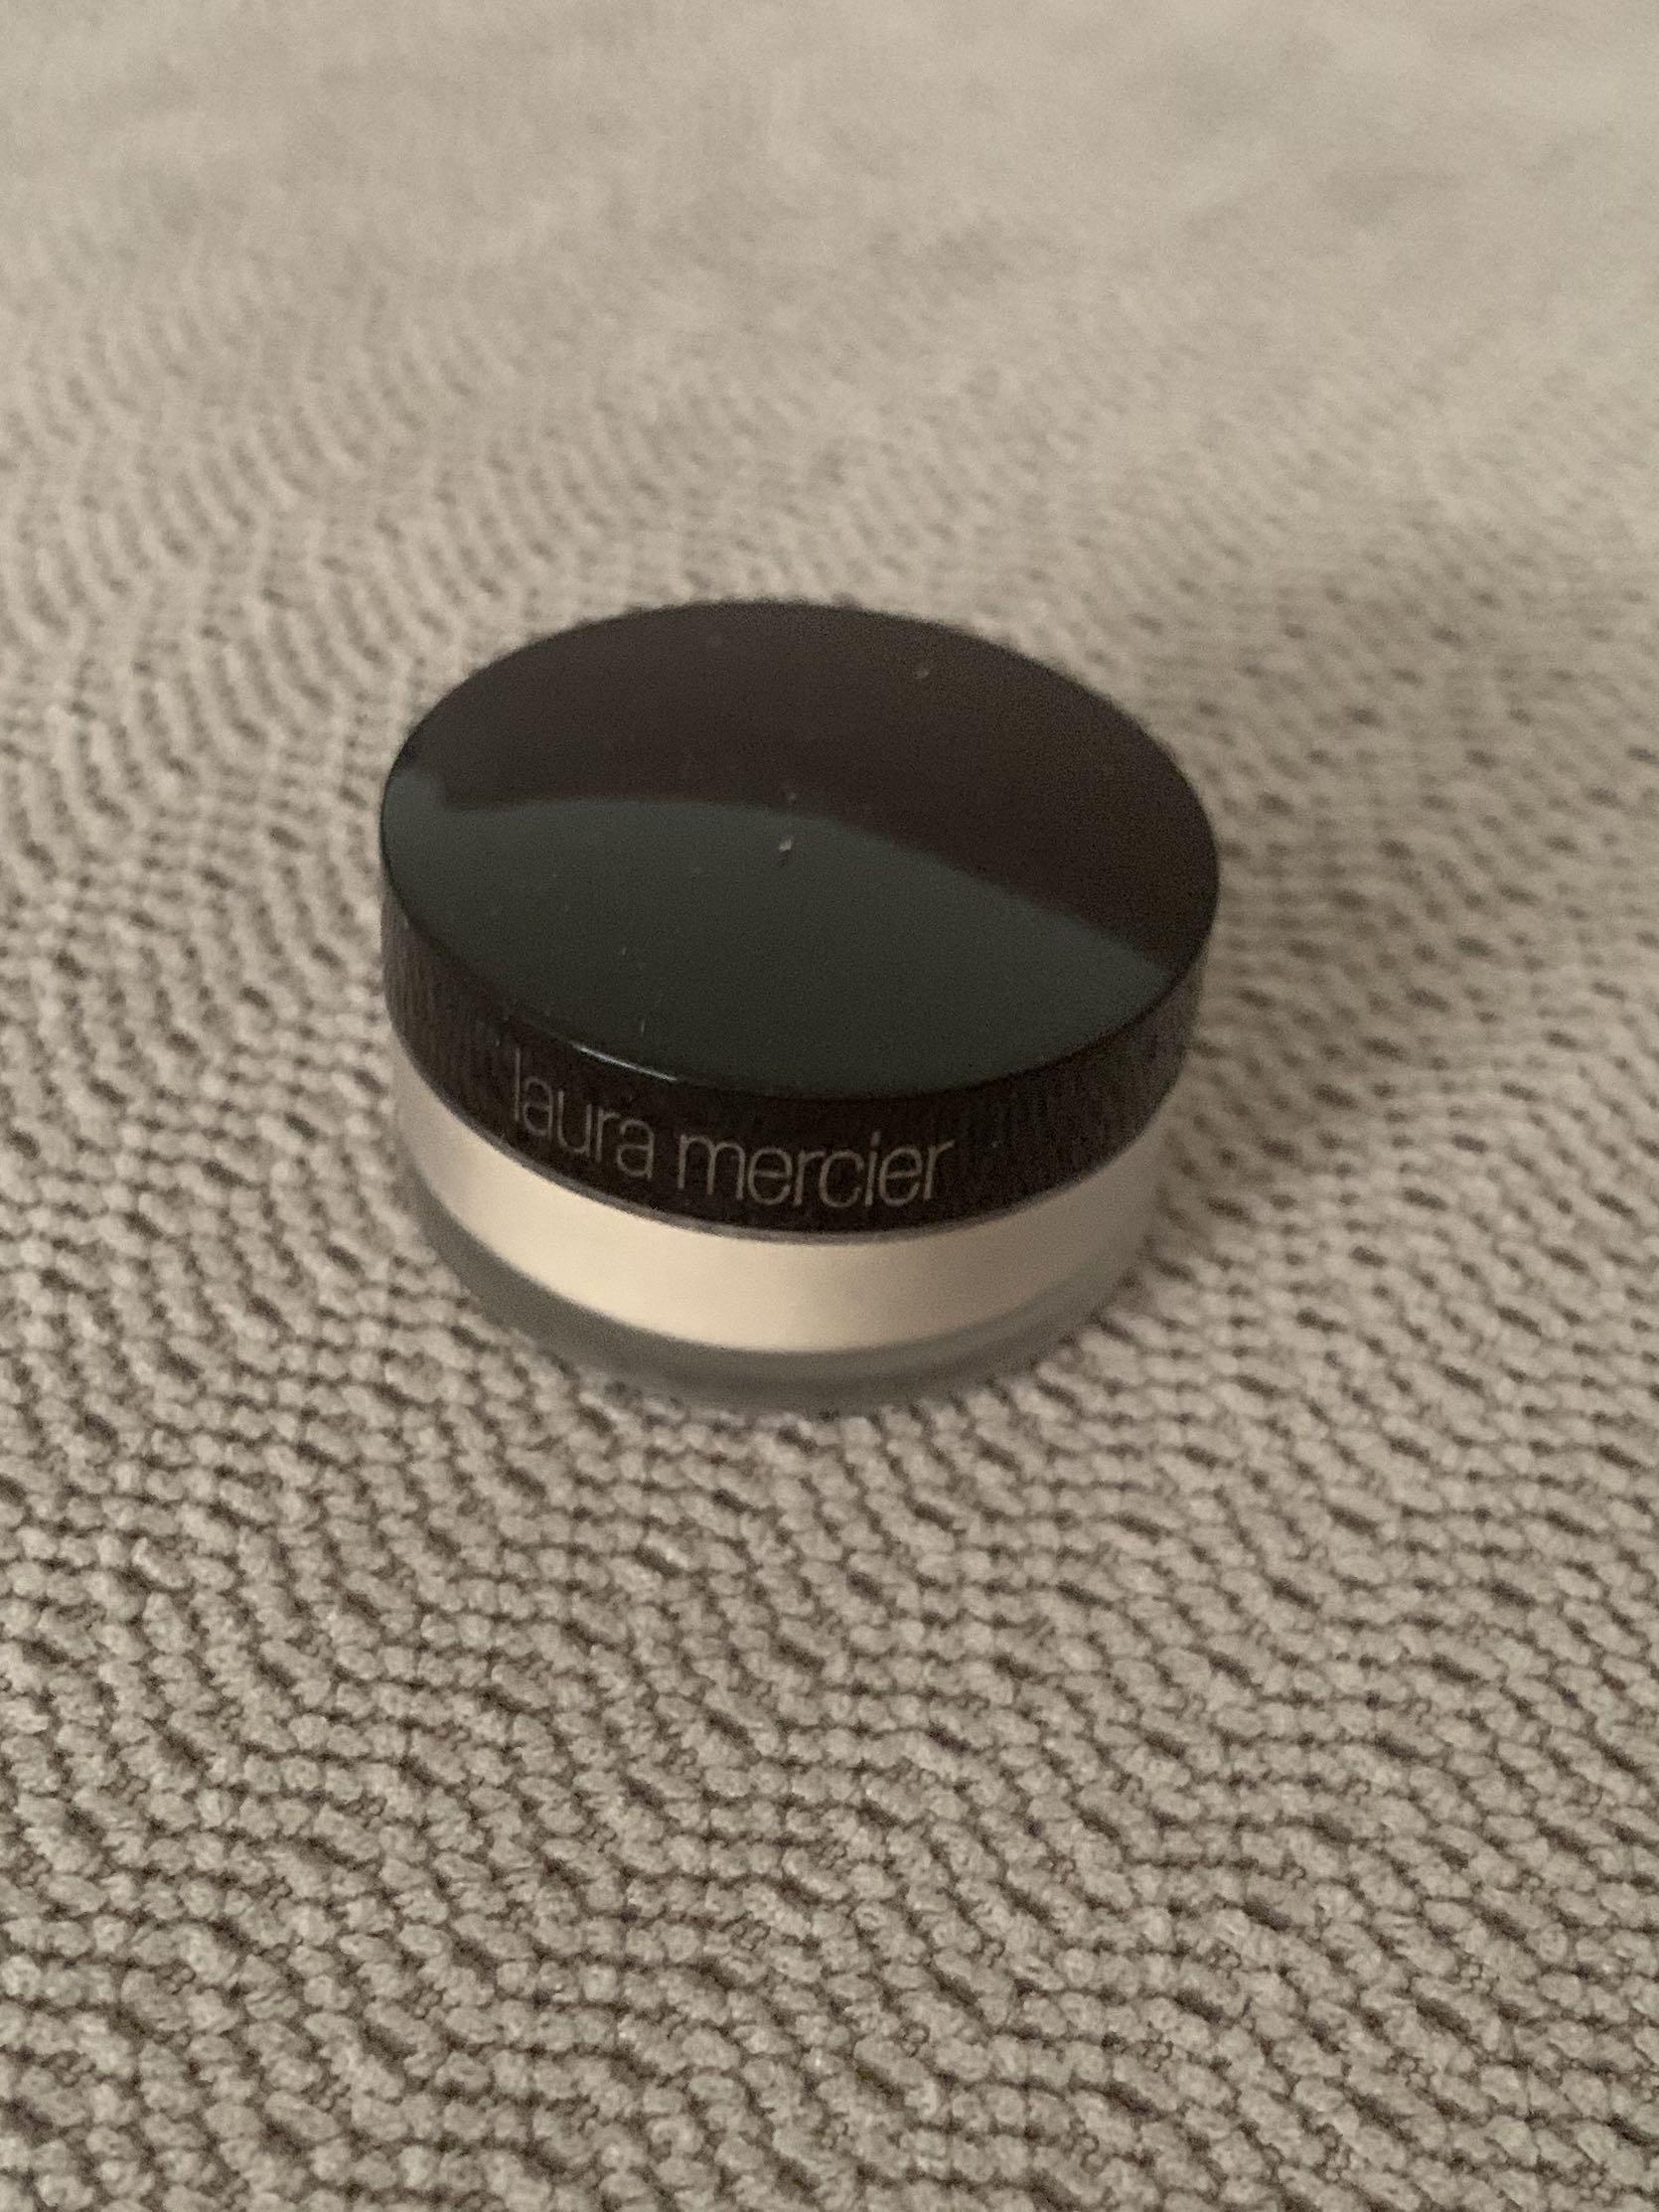 Laura Mercier loose setting powder 3.5g sample size